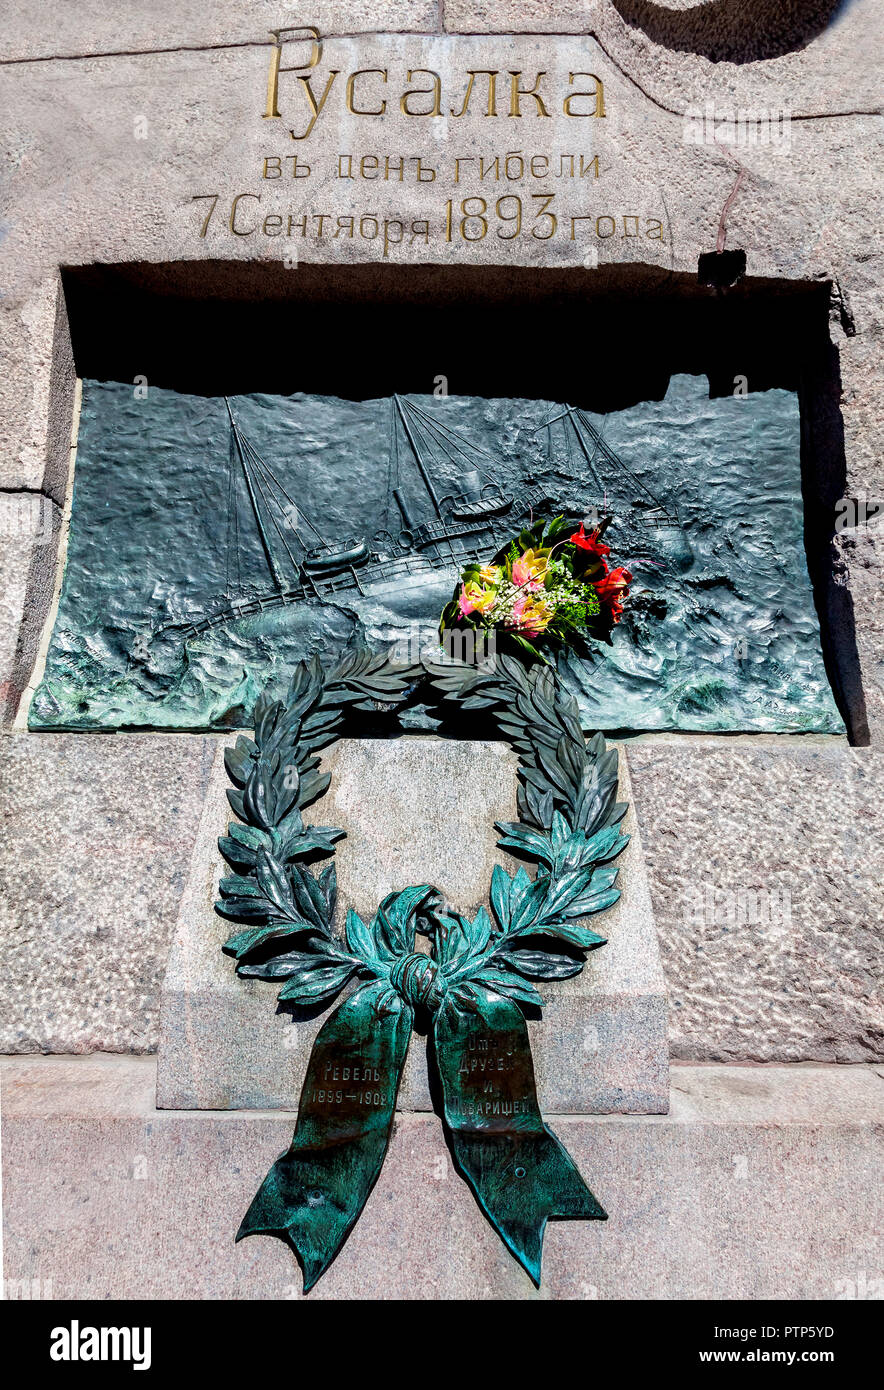 Russalka Memorial in Tallinn commemorating the sinking of Russian warship Rusalka in 1893 - Stock Image